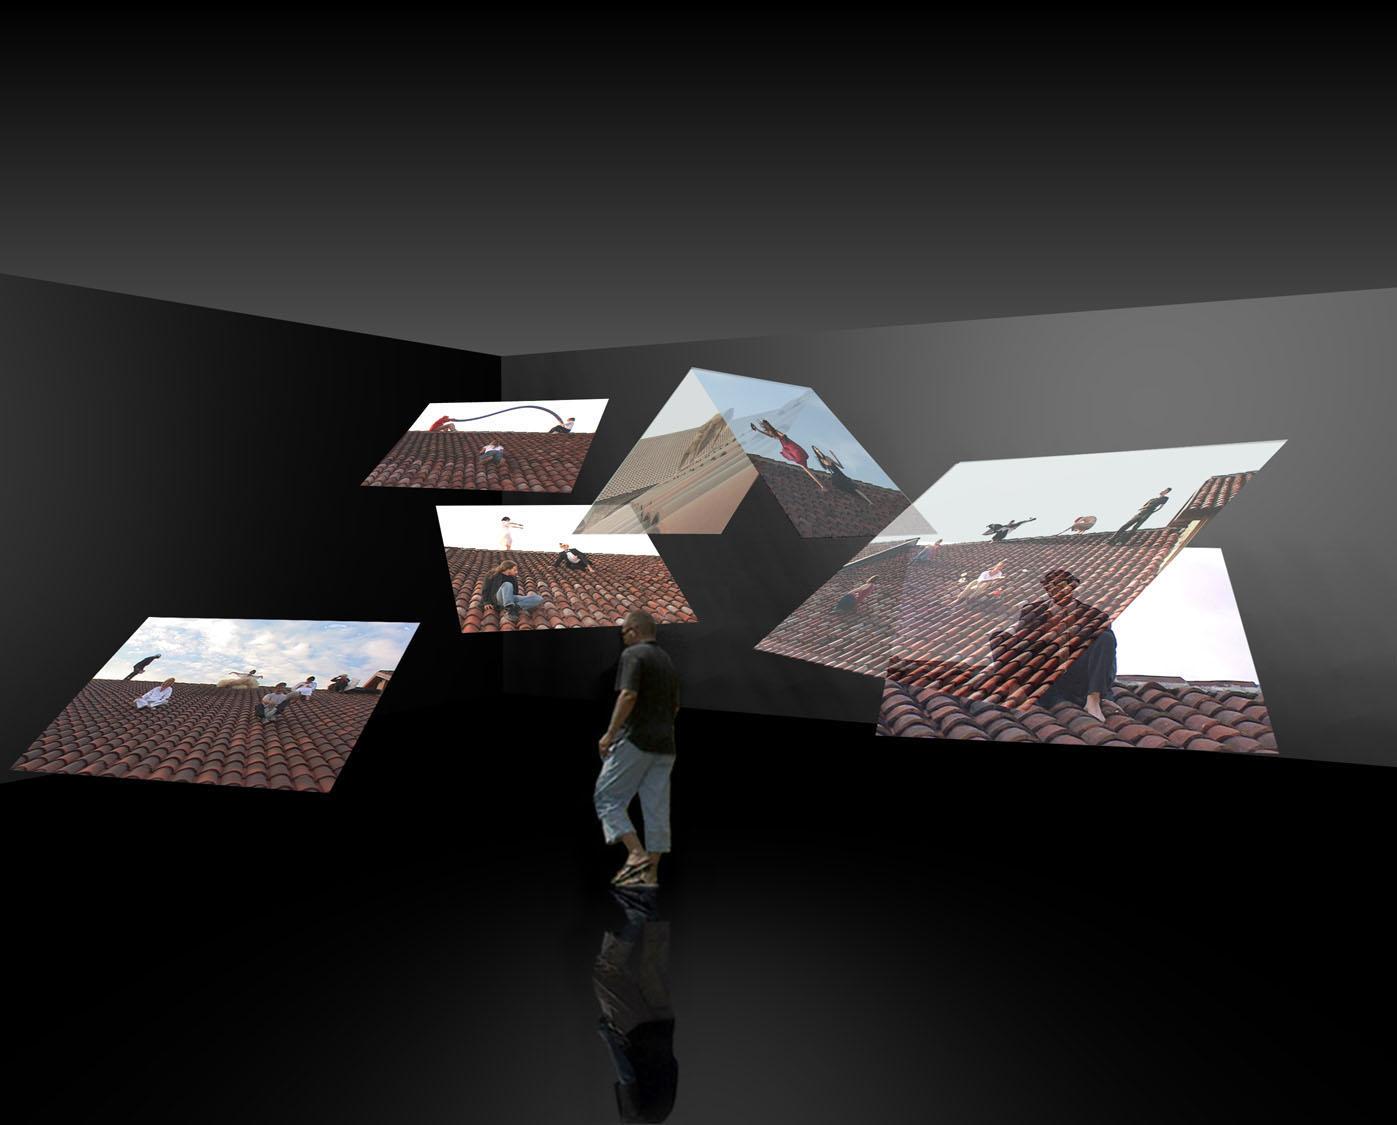 Zona Franca, 2004, videoinstallazione, n. 7 schermi, n. 7 videoproiettori, 1 stazione digitale, amplificatori